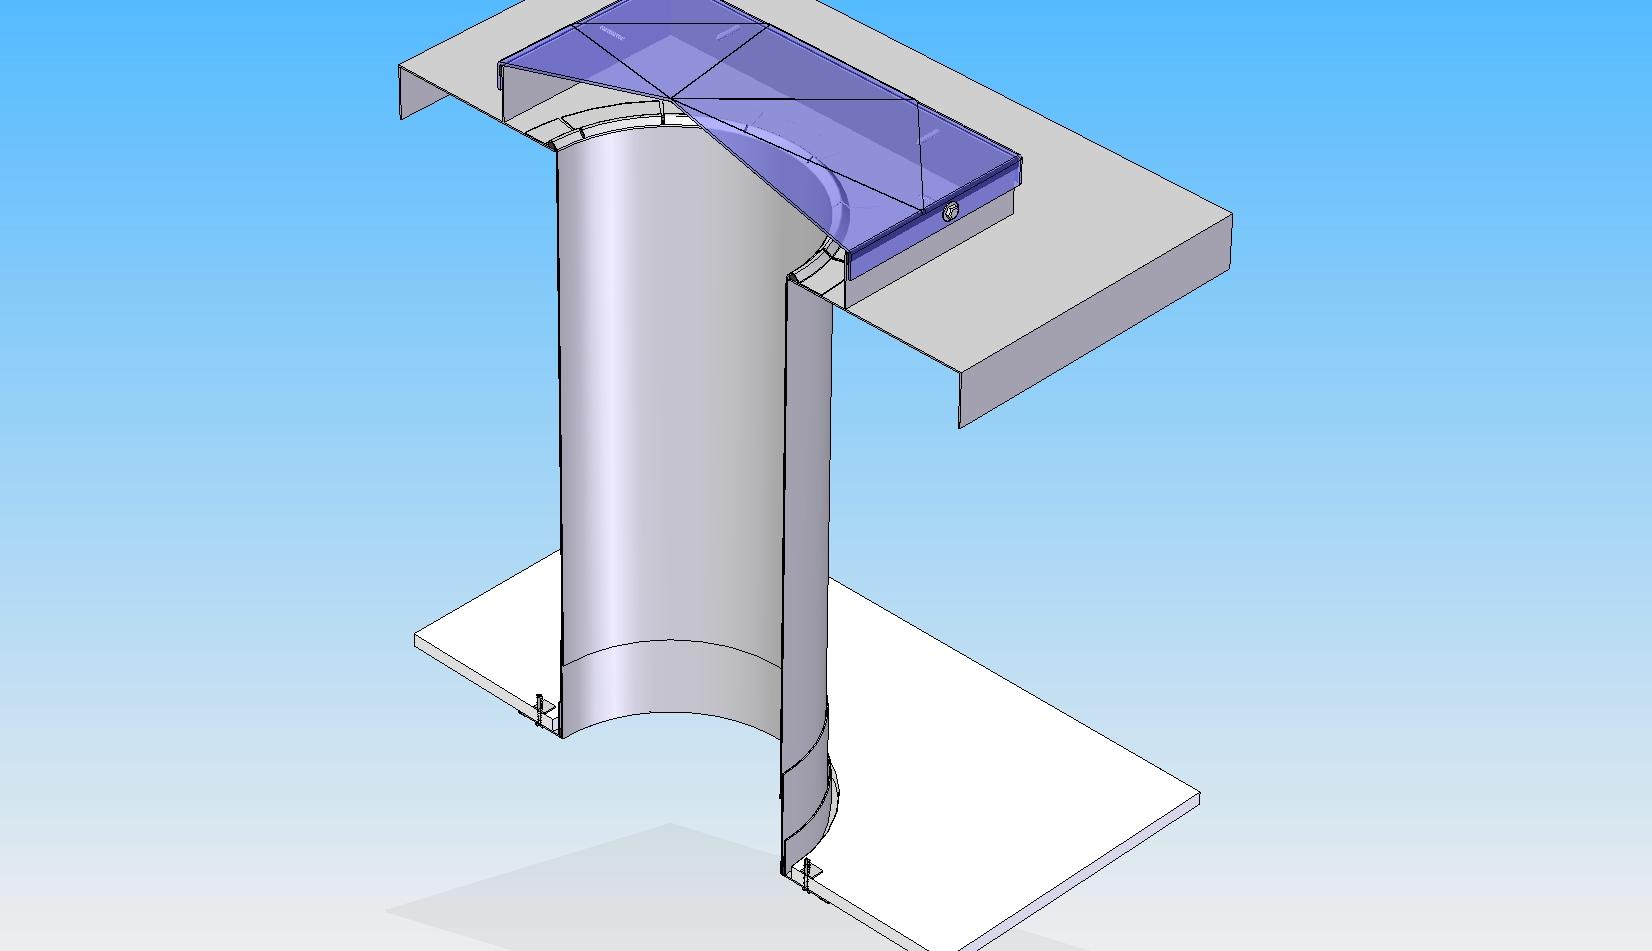 solar tube commercial curb flashing (1).jpg